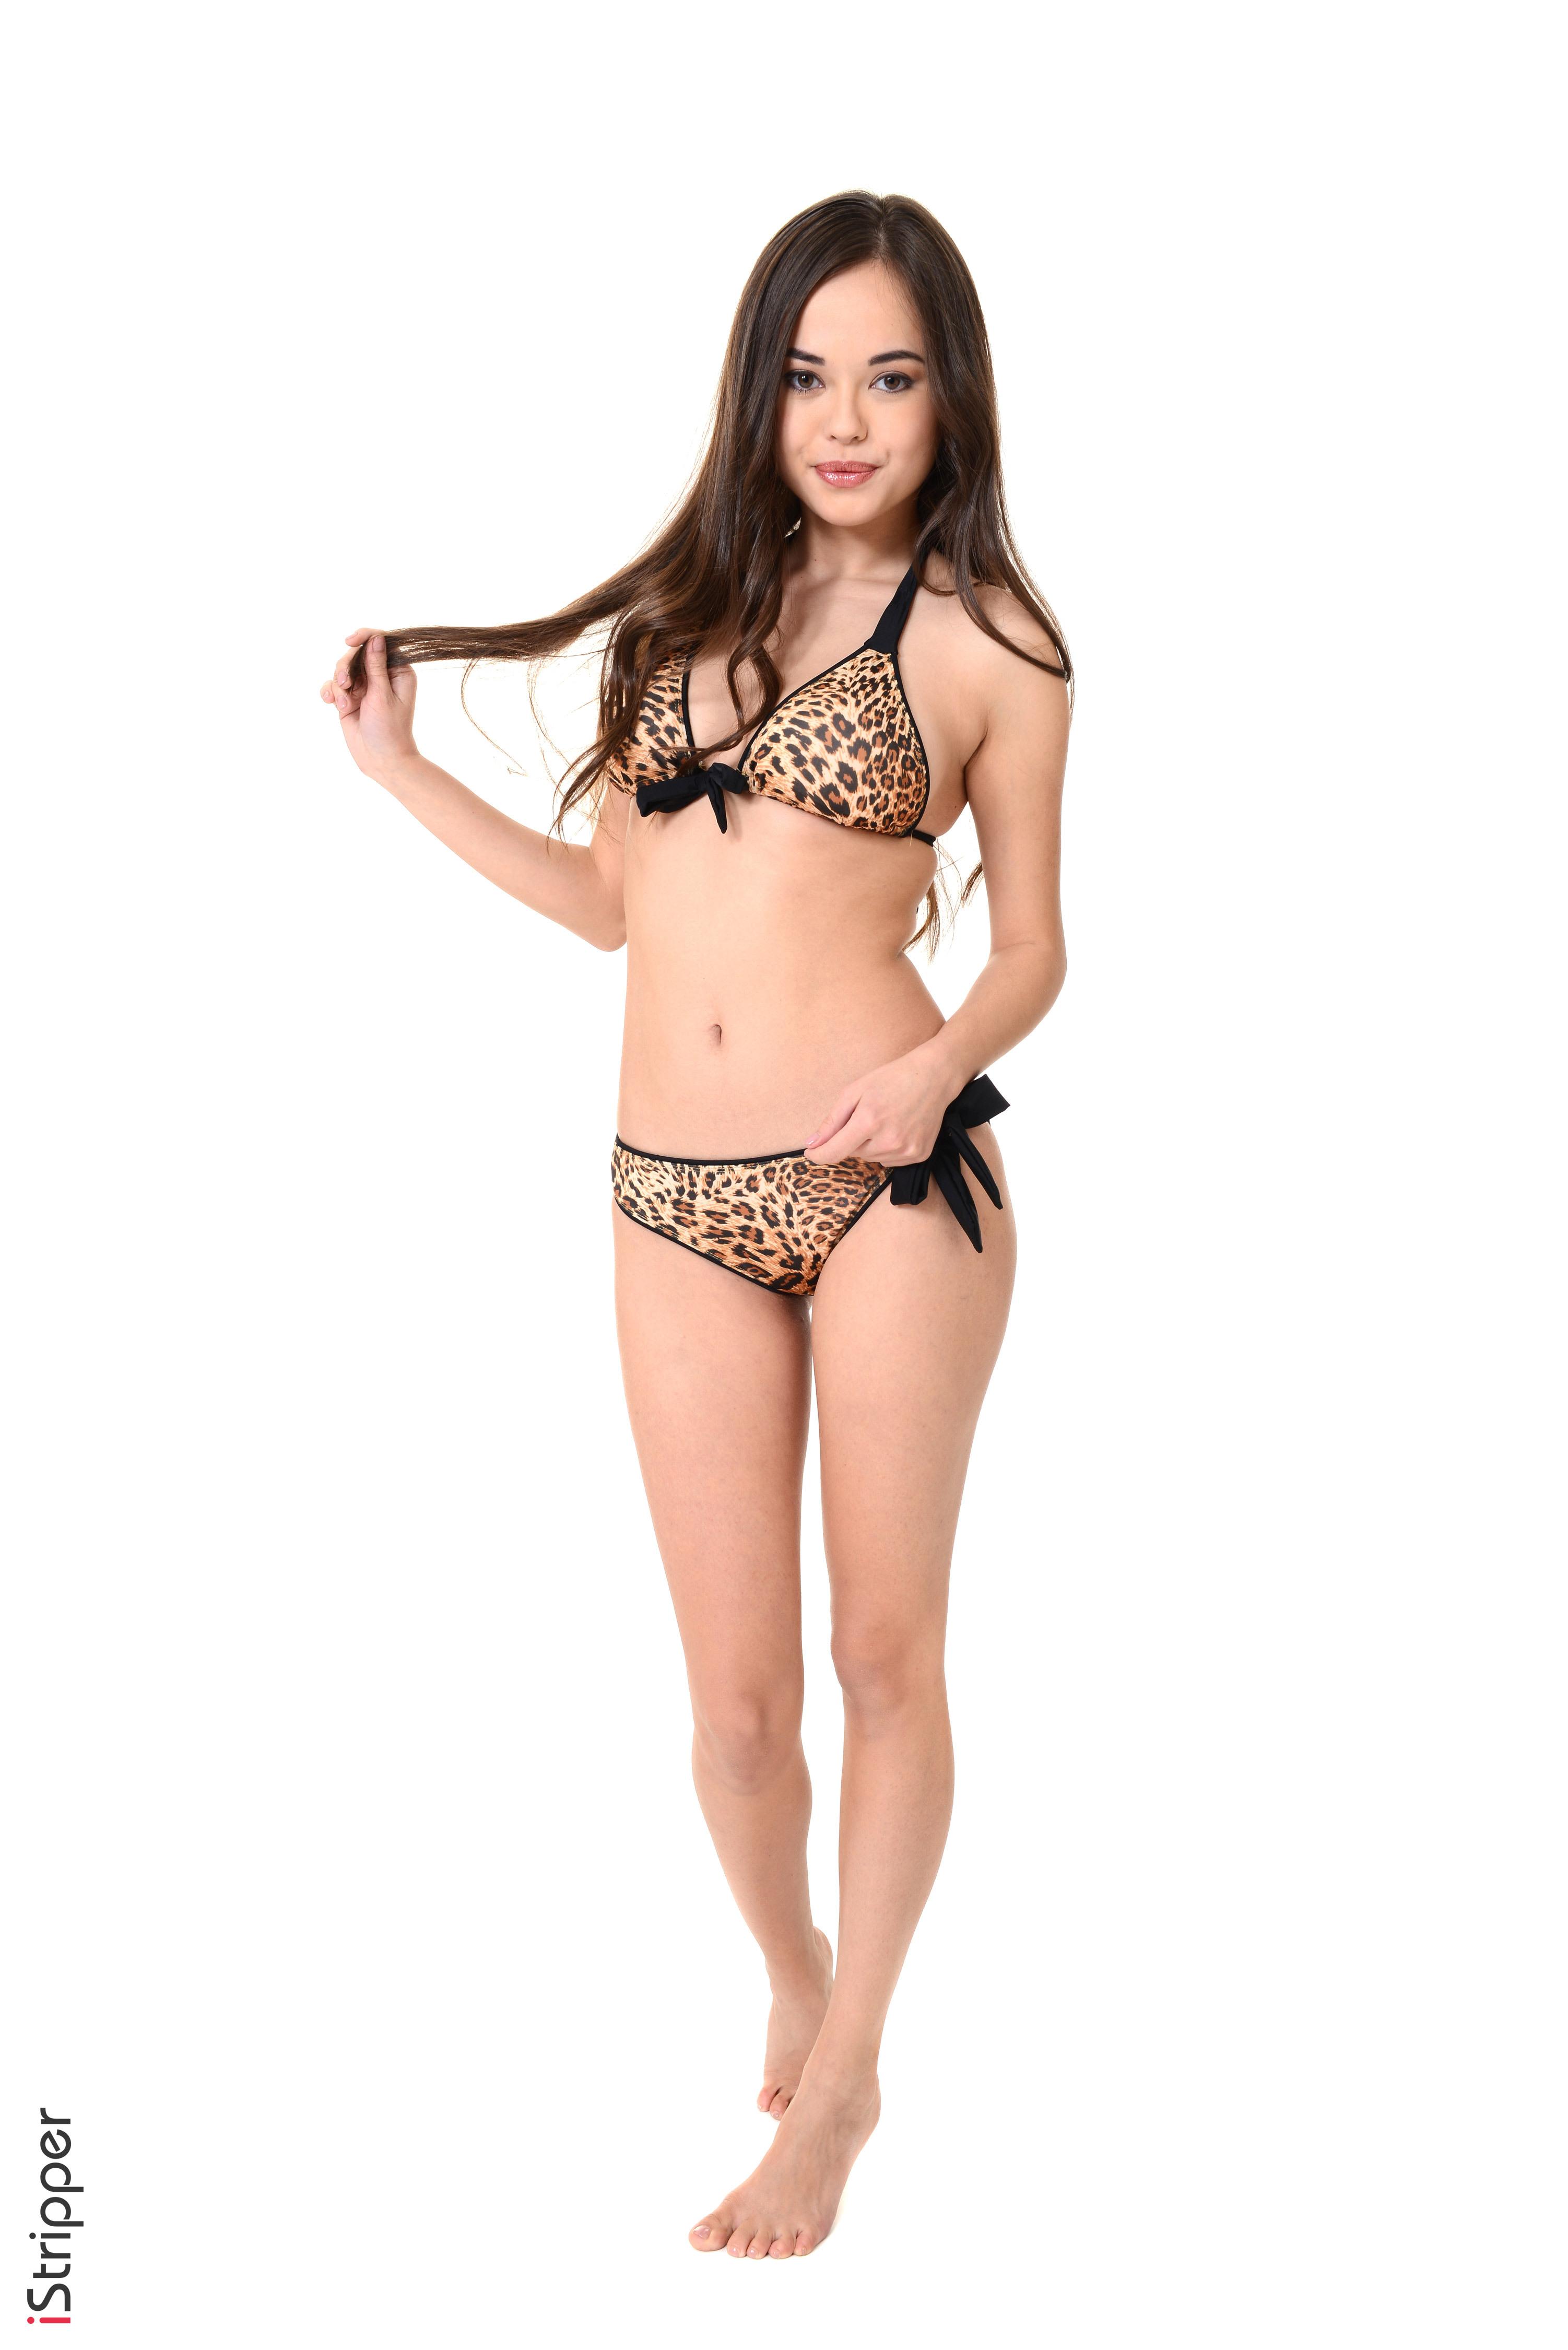 girls stripping nude gifs pink bra